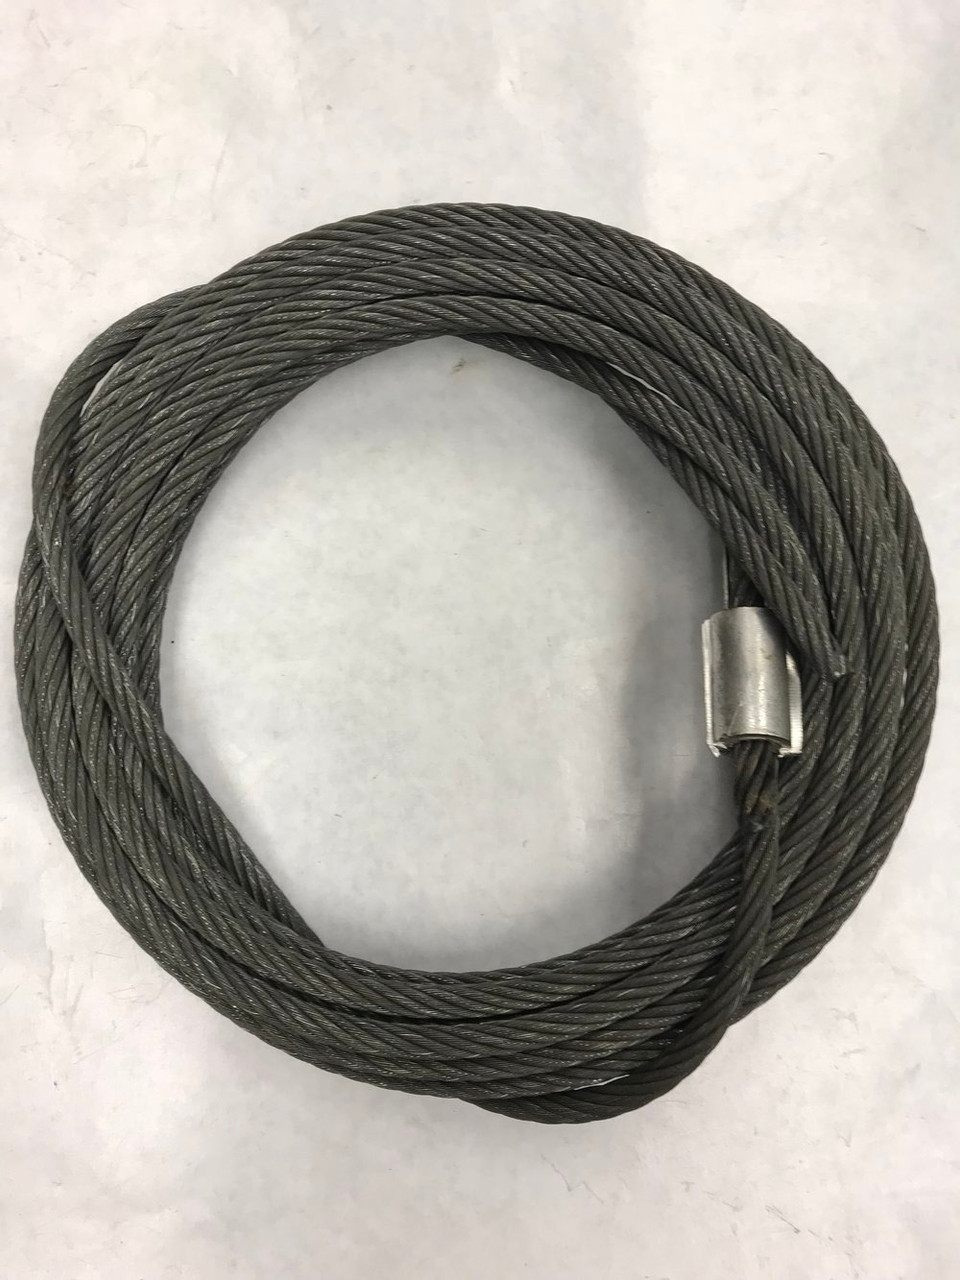 tommy-lift-004624-lift-cable-wrivet-516